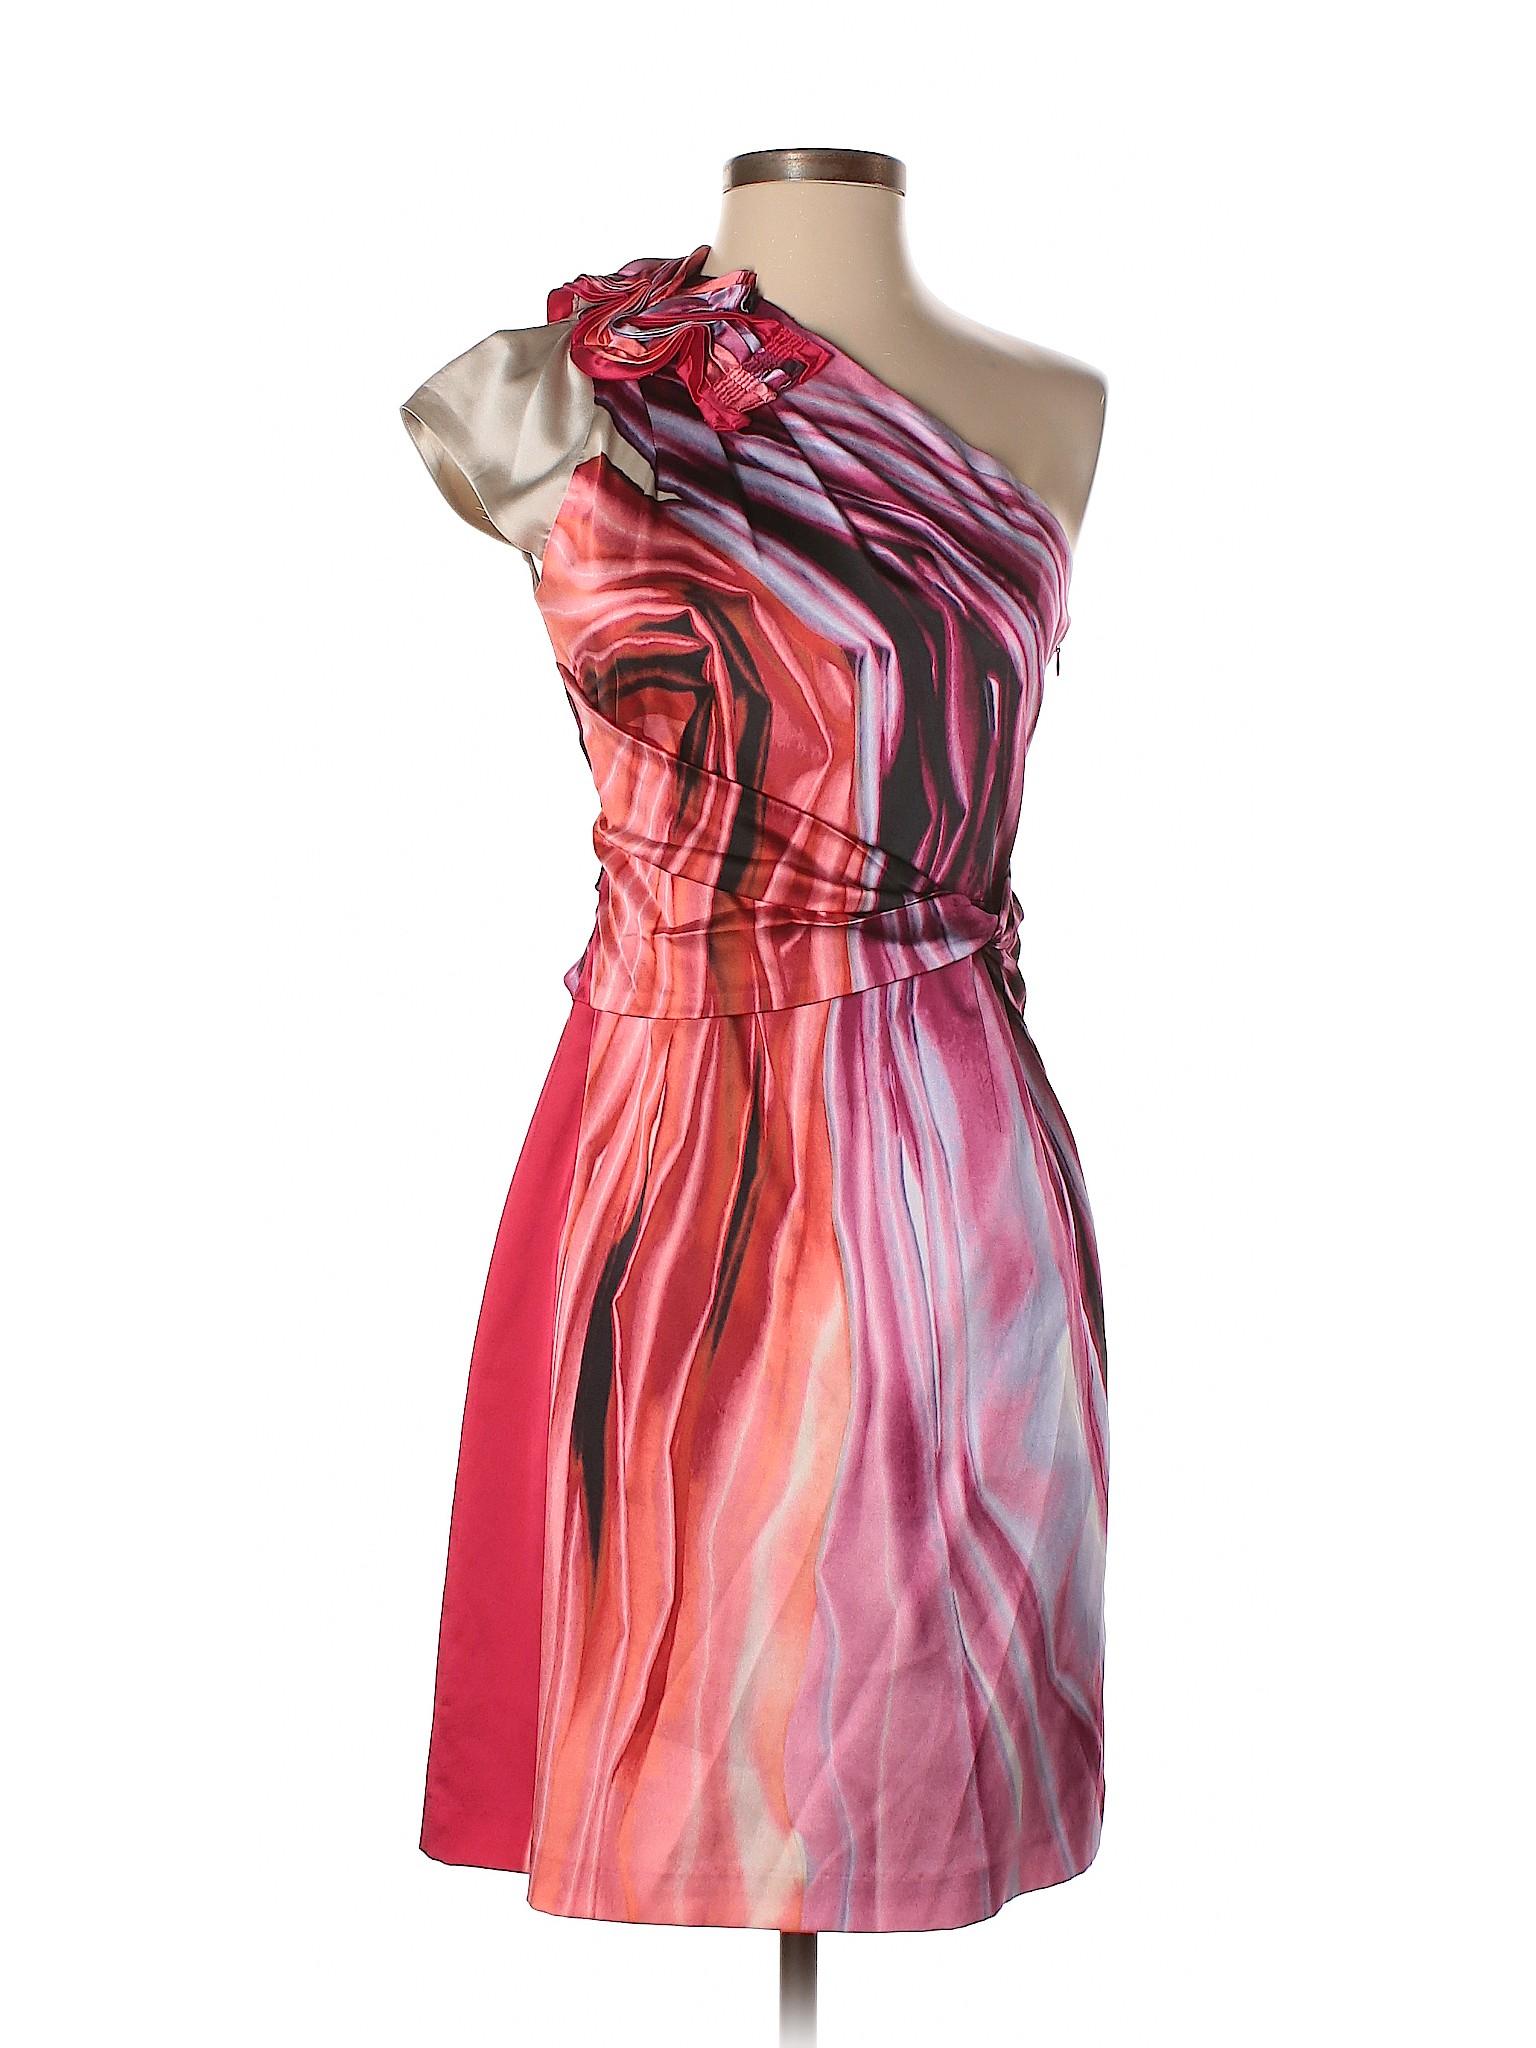 Tahari Selling Dress Elie Elie Casual Tahari Tahari Elie Dress Selling Casual Selling wzRxg0